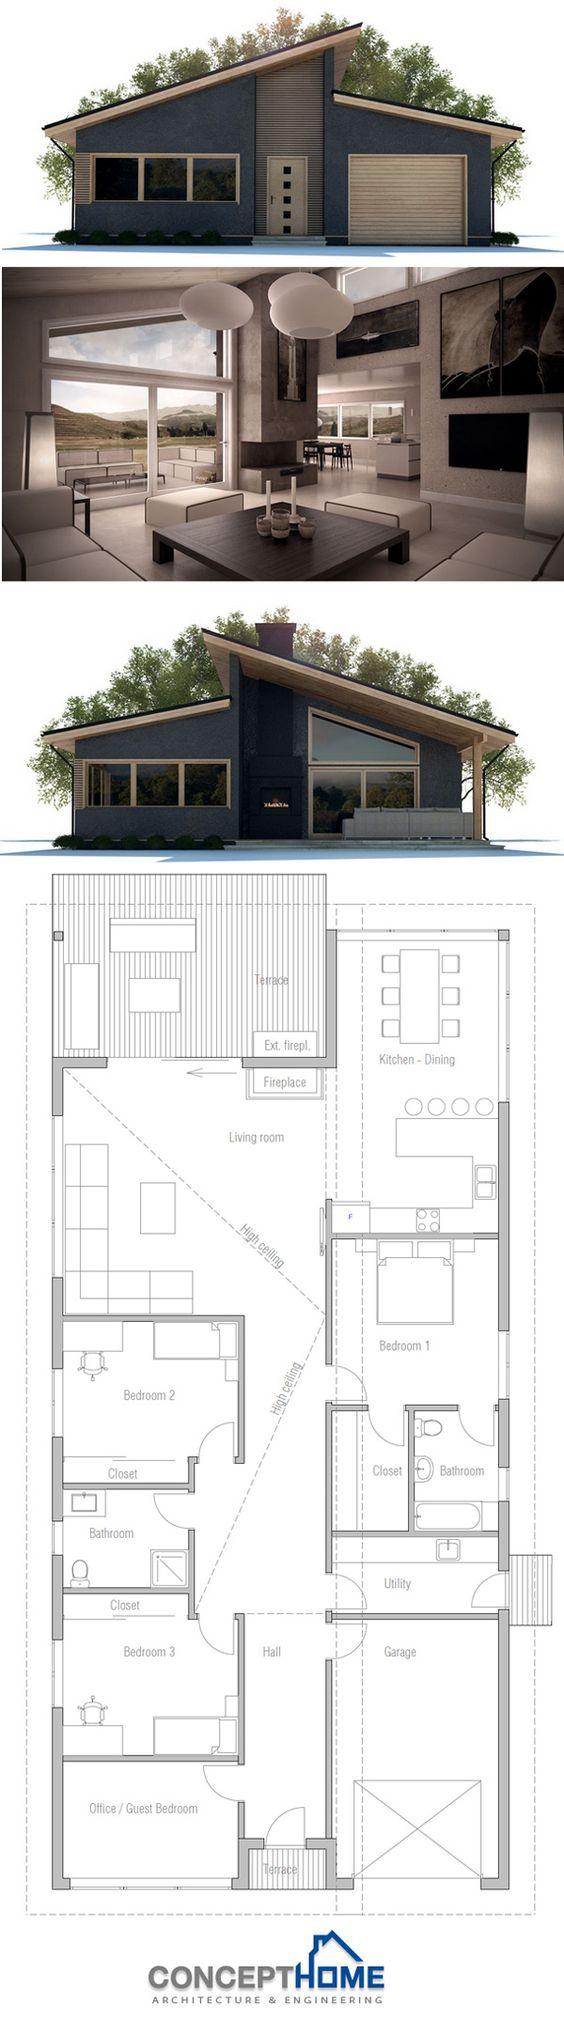 Pinterest the world s catalog of ideas for Big modern house plans